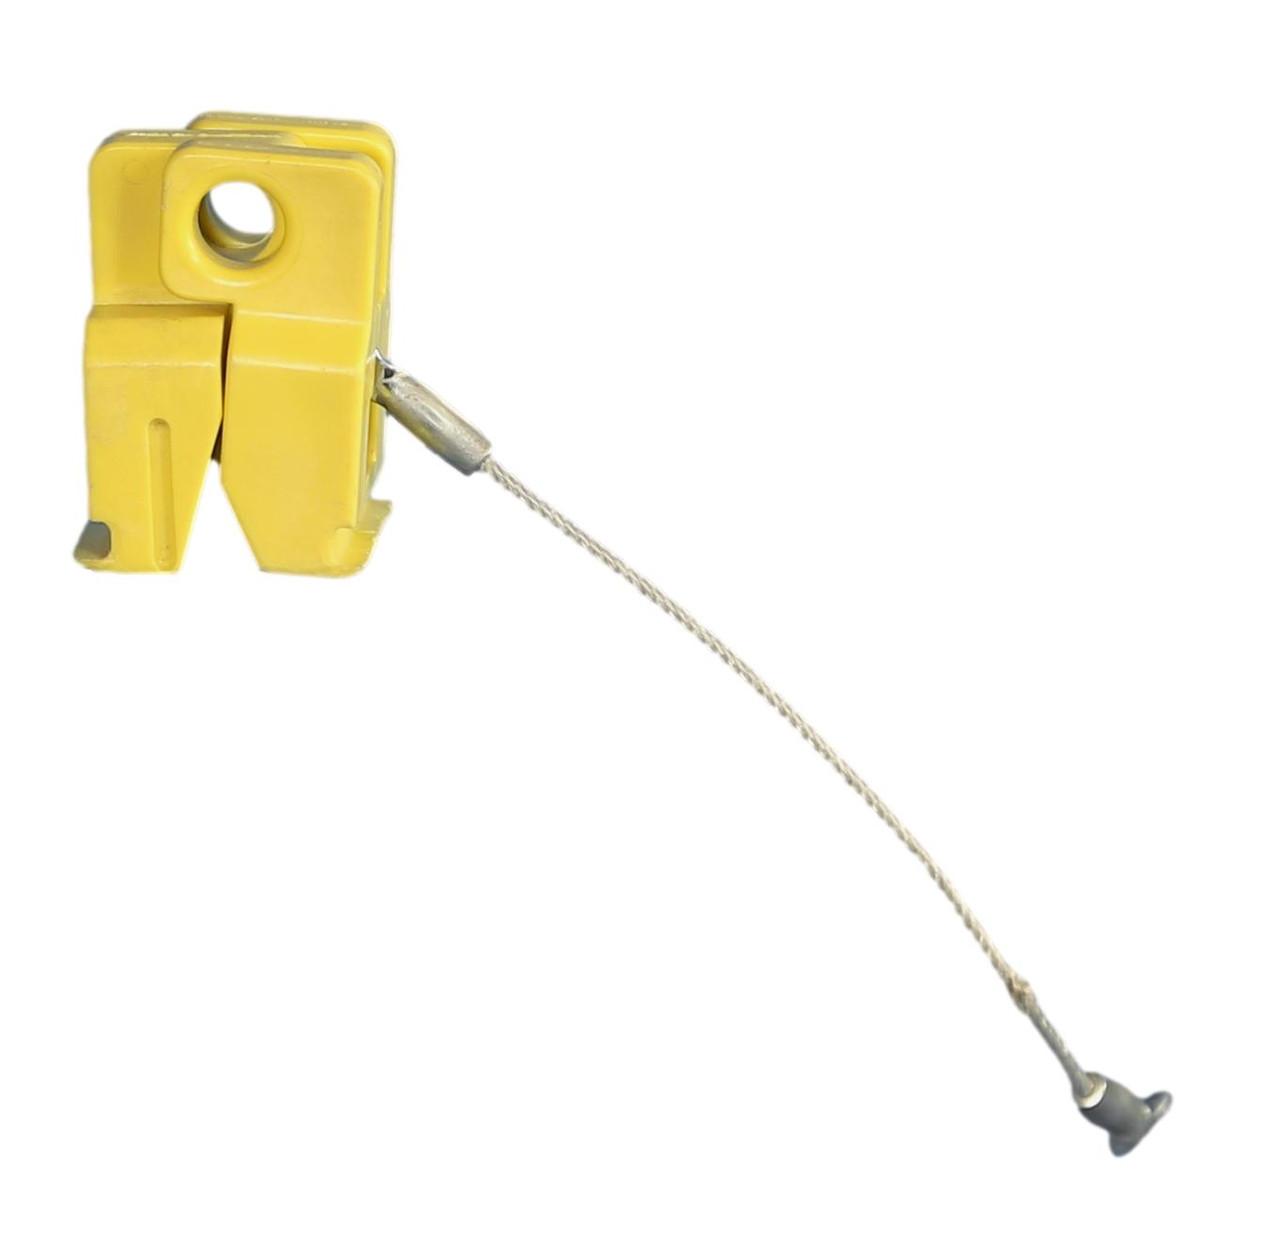 PHB3 Eaton Handle Lockable Lockout